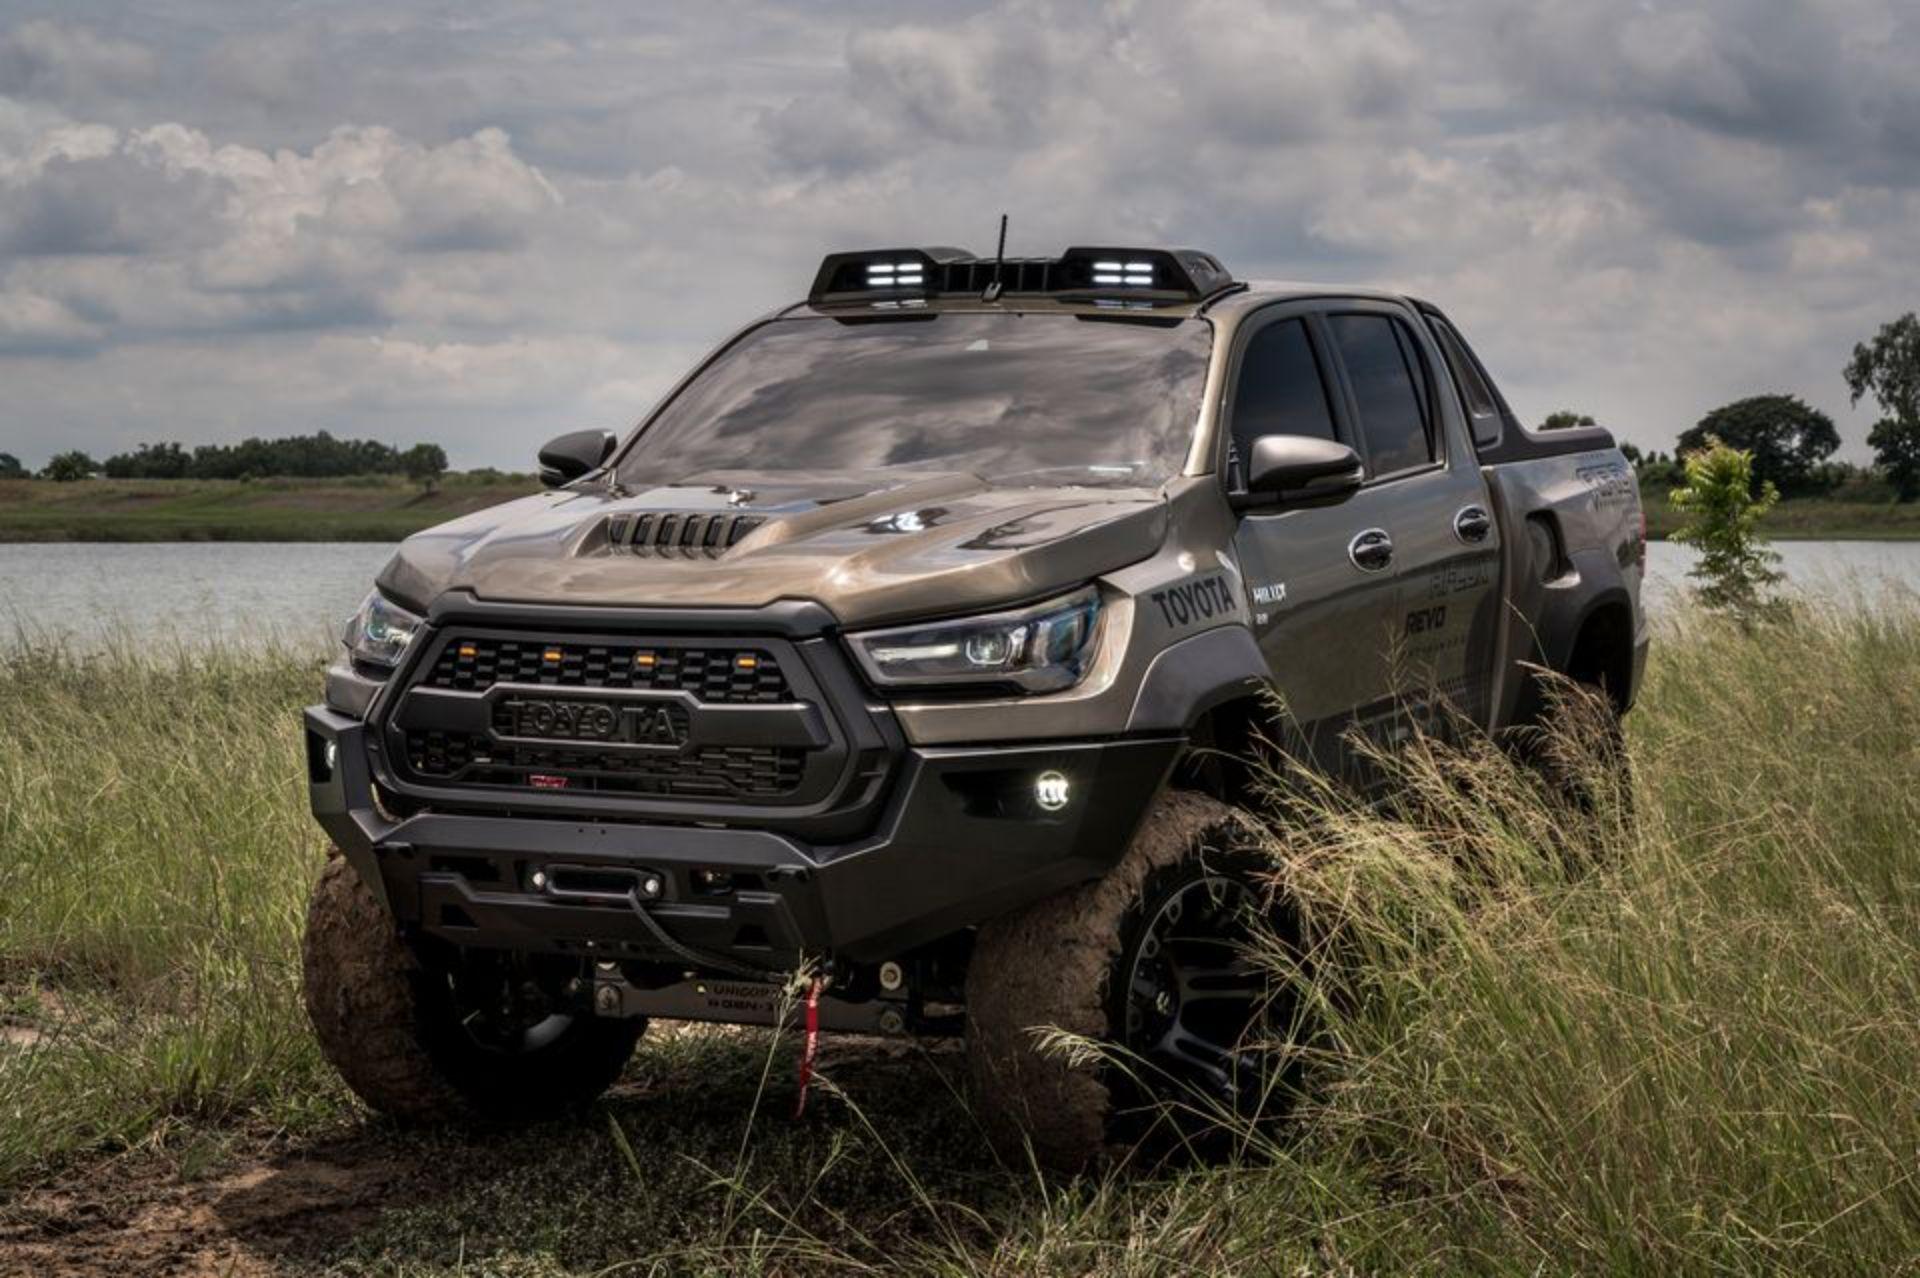 Toyota-Hilux-Pathfinder-by-RAD-5